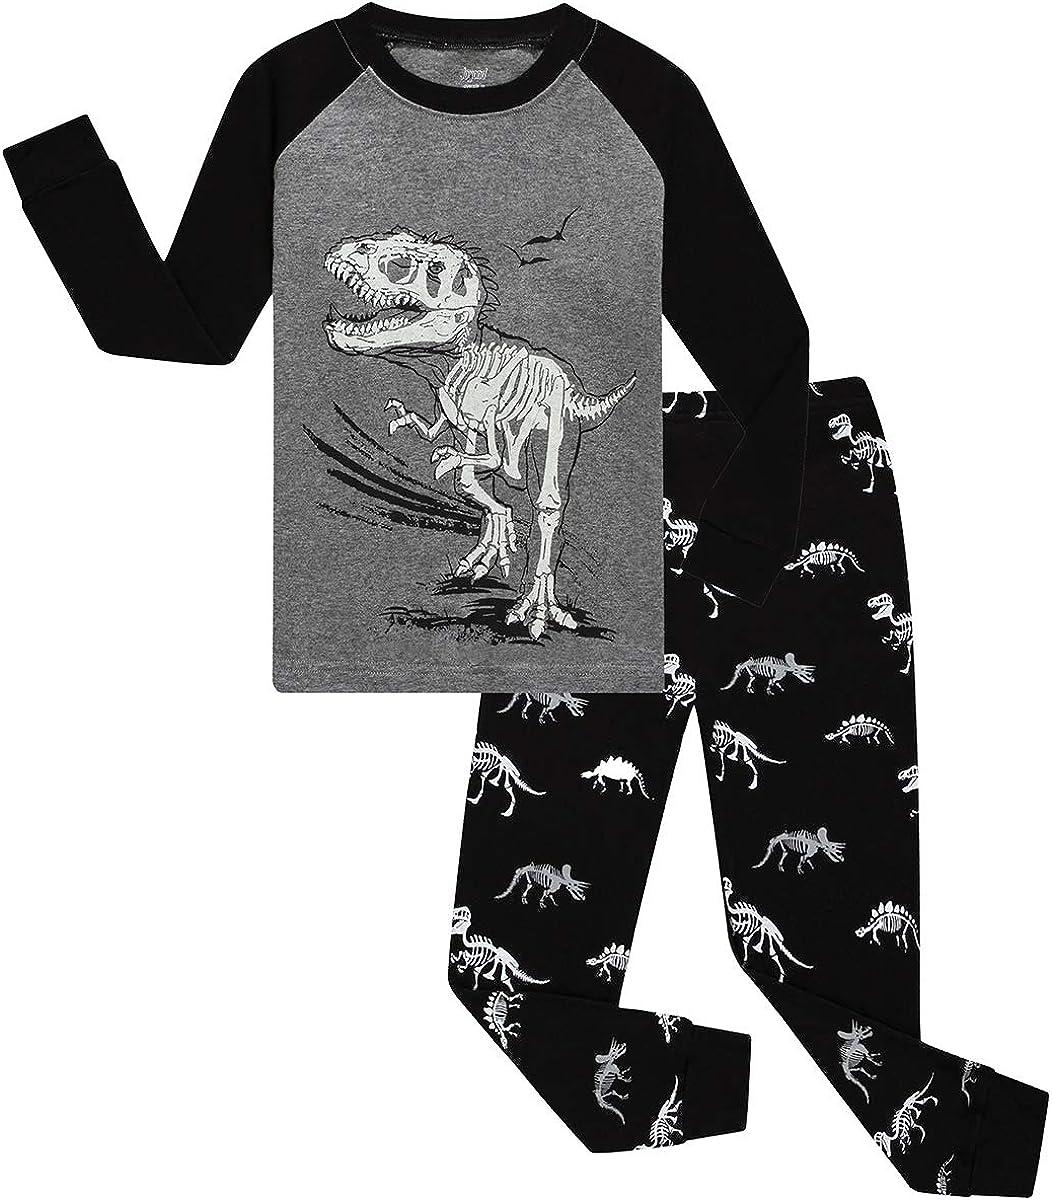 Joyond Cotton Pajamas for Boys Toddler Clothes Kids Snug-Fit Long Sleeve Pjs Pants Set(grey dino,6)